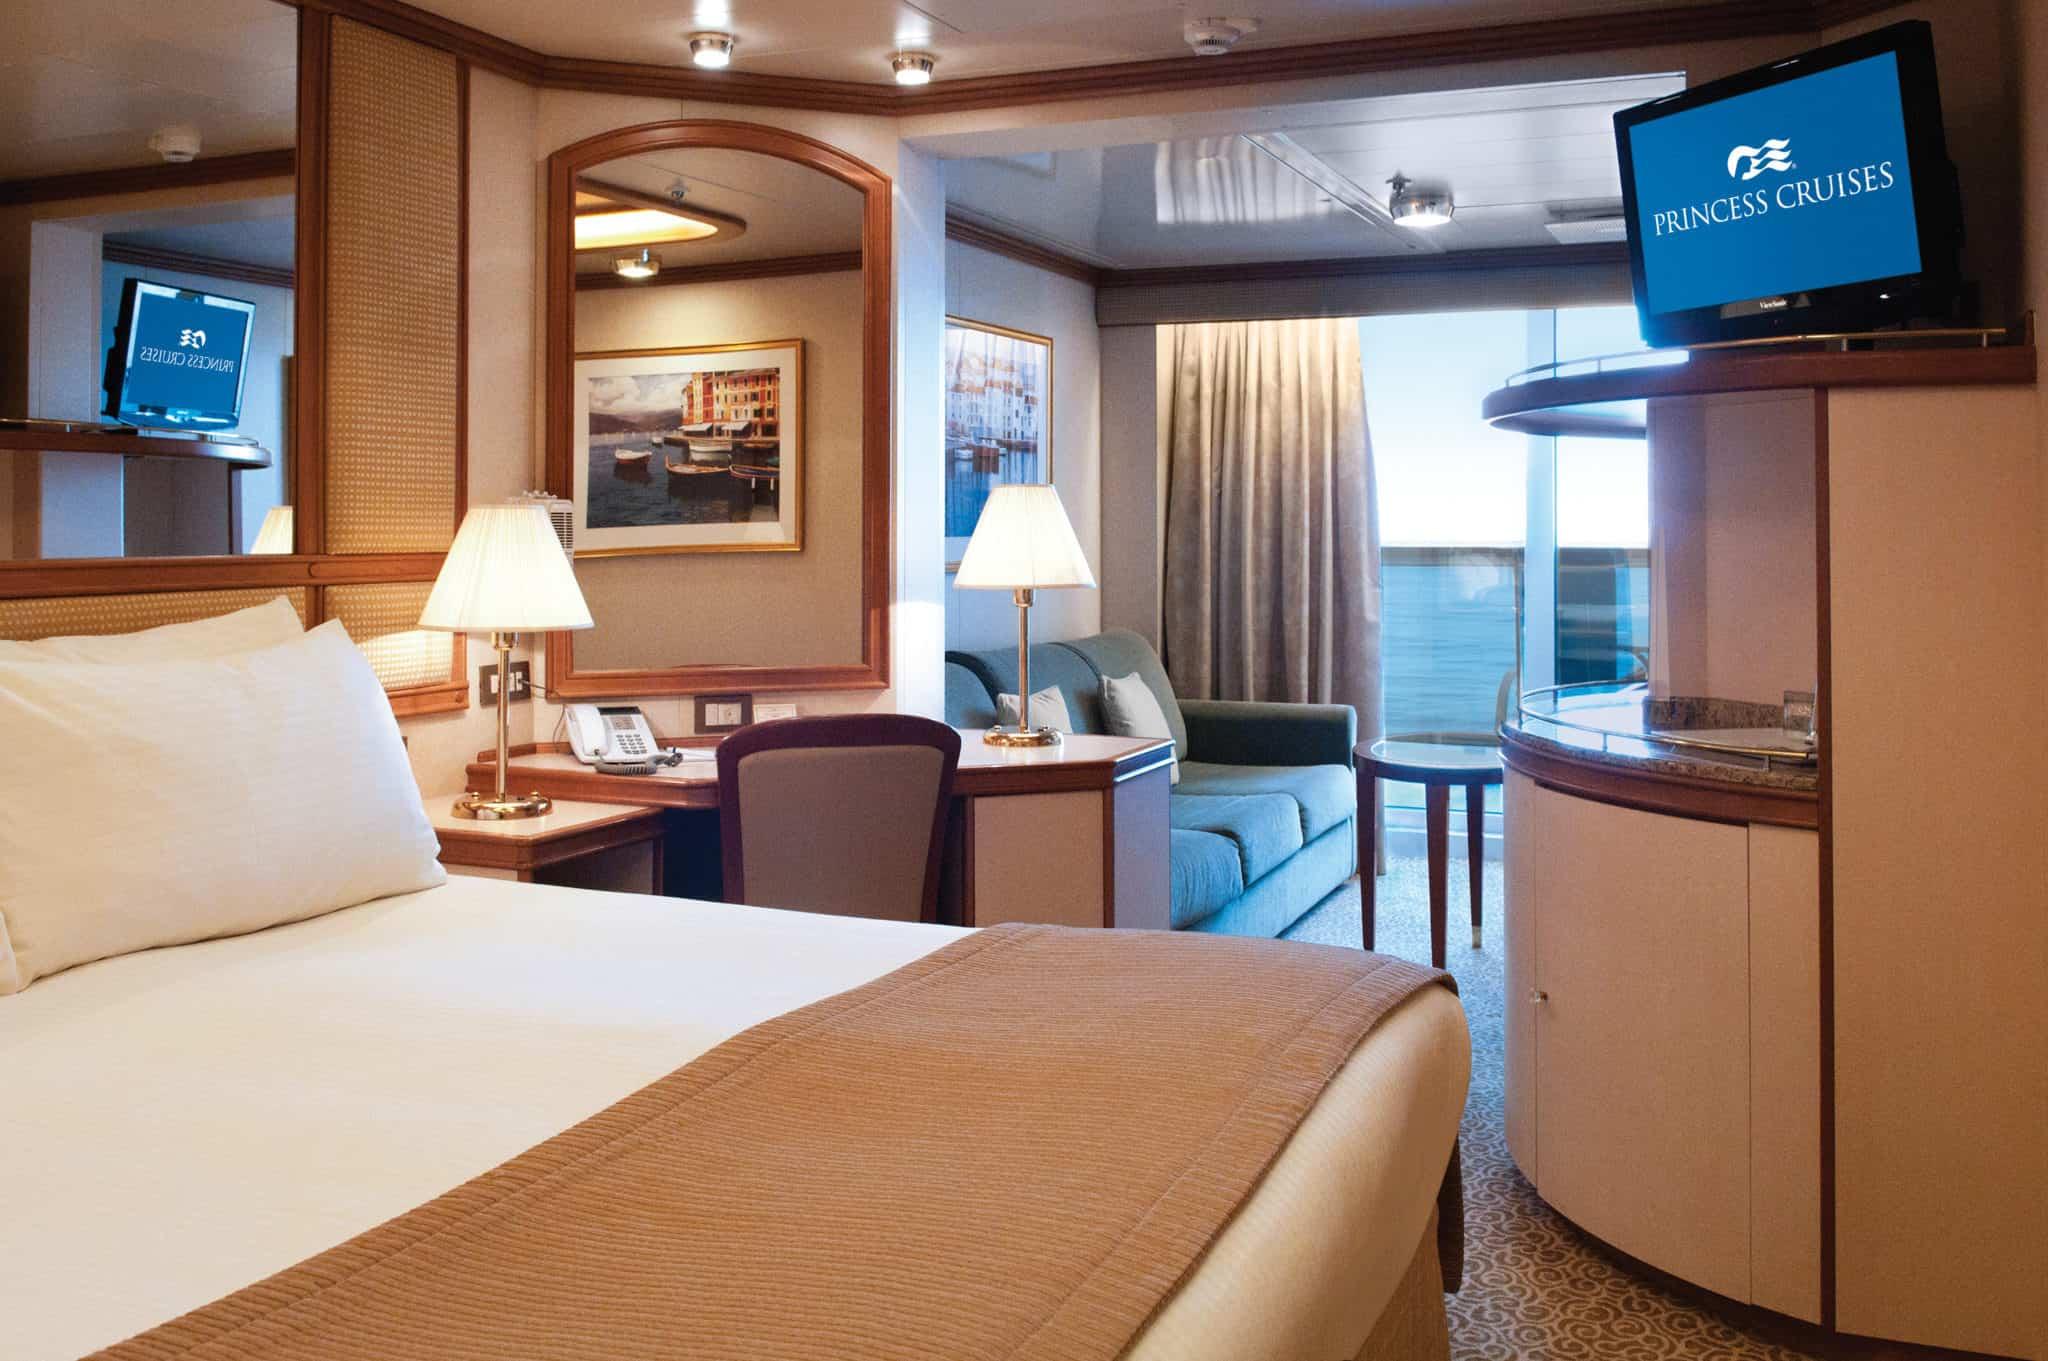 crown suite princess cruises